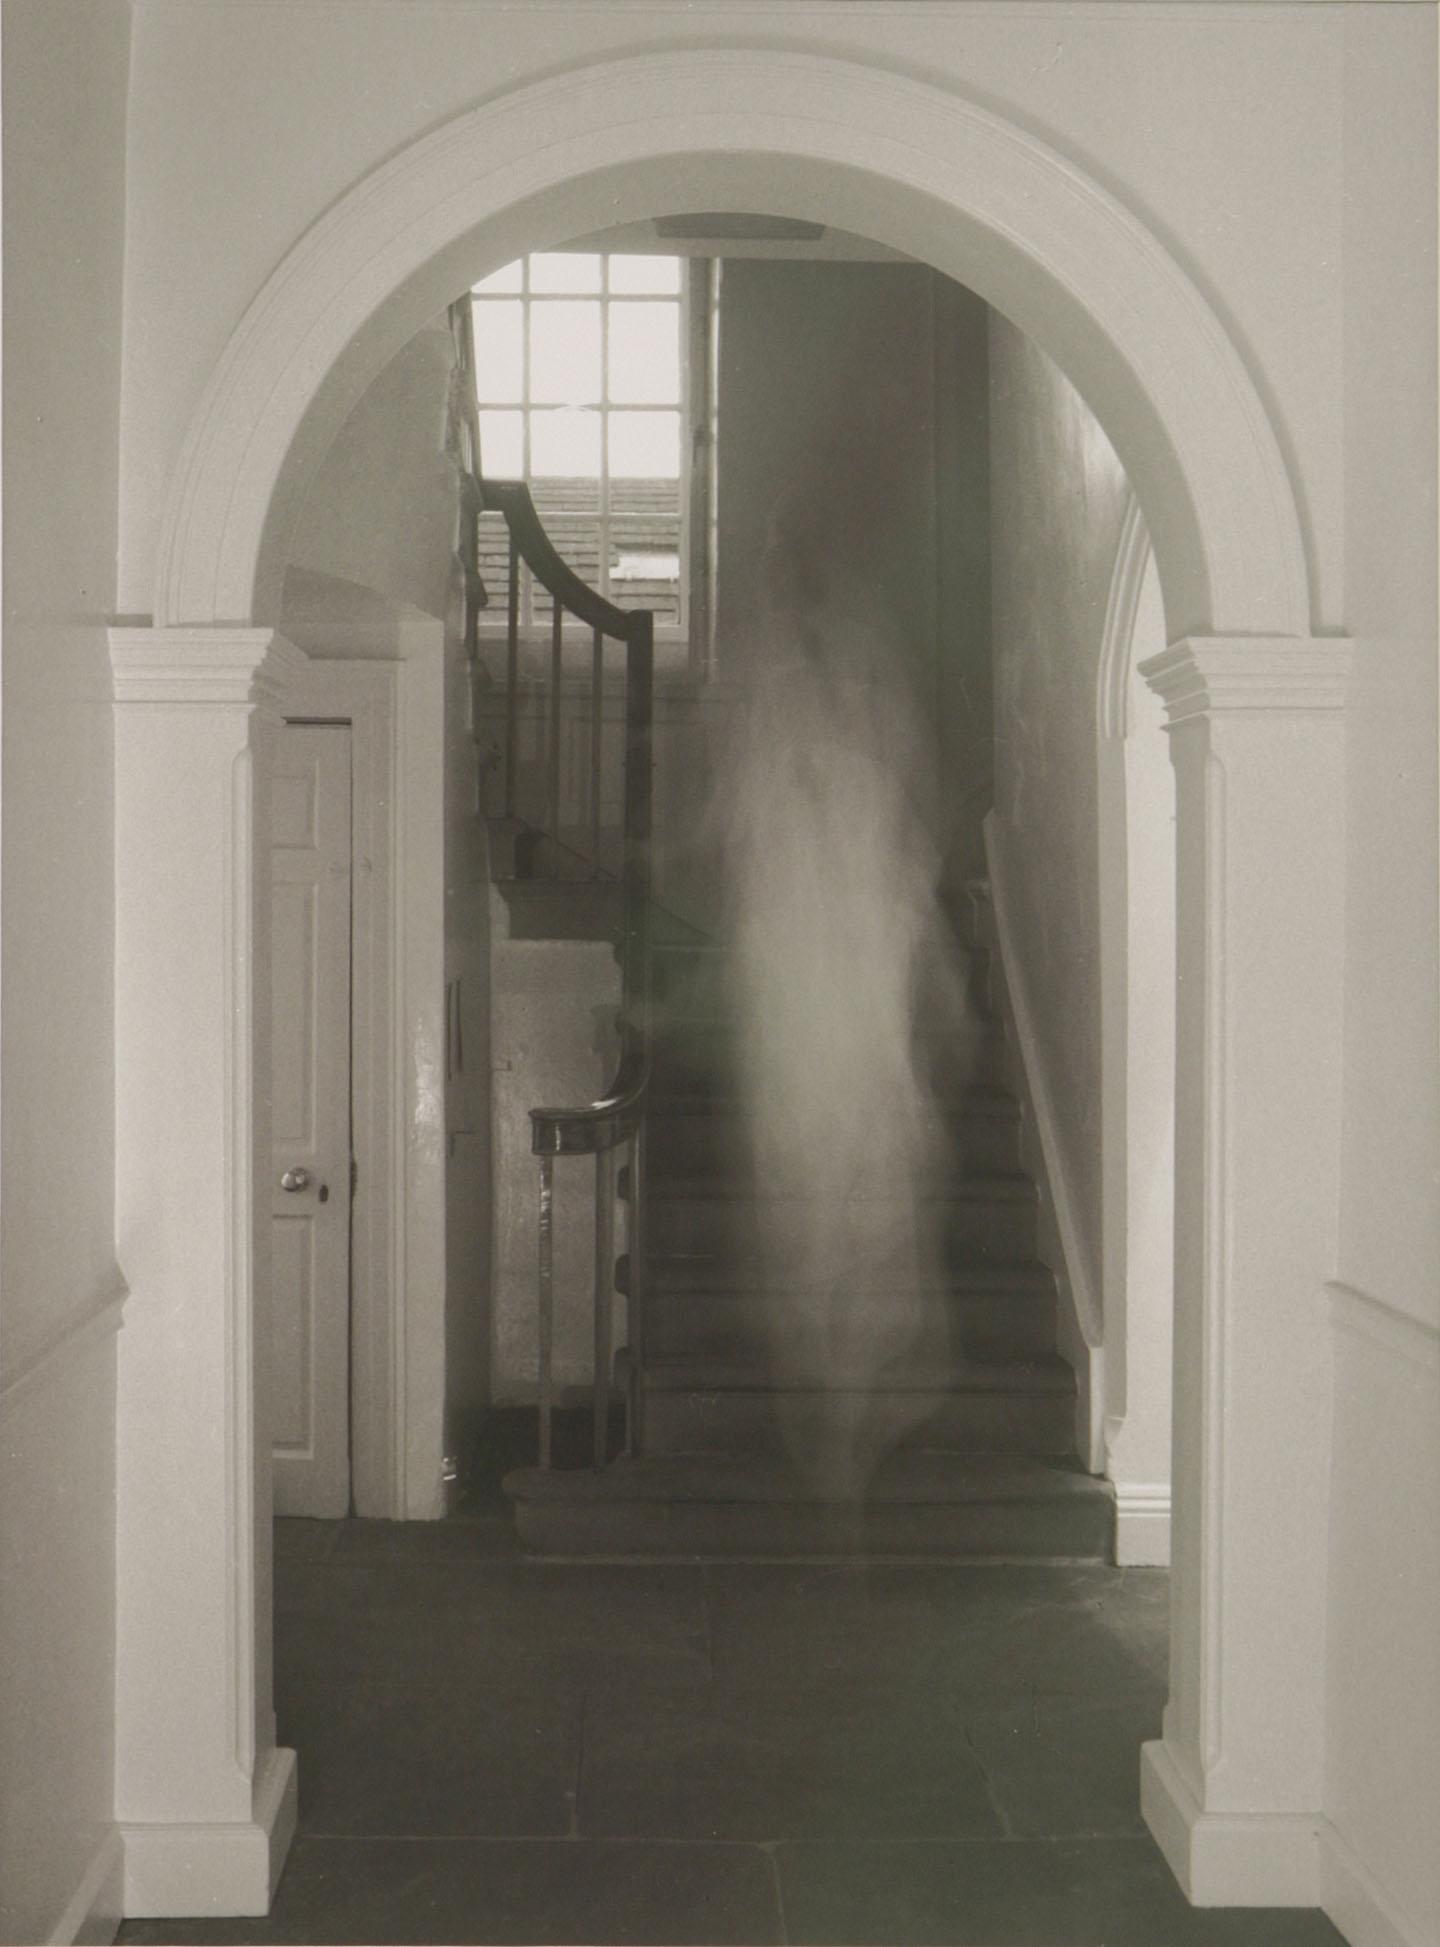 Bertola-Residual-hauntings-Hallway-2011-04